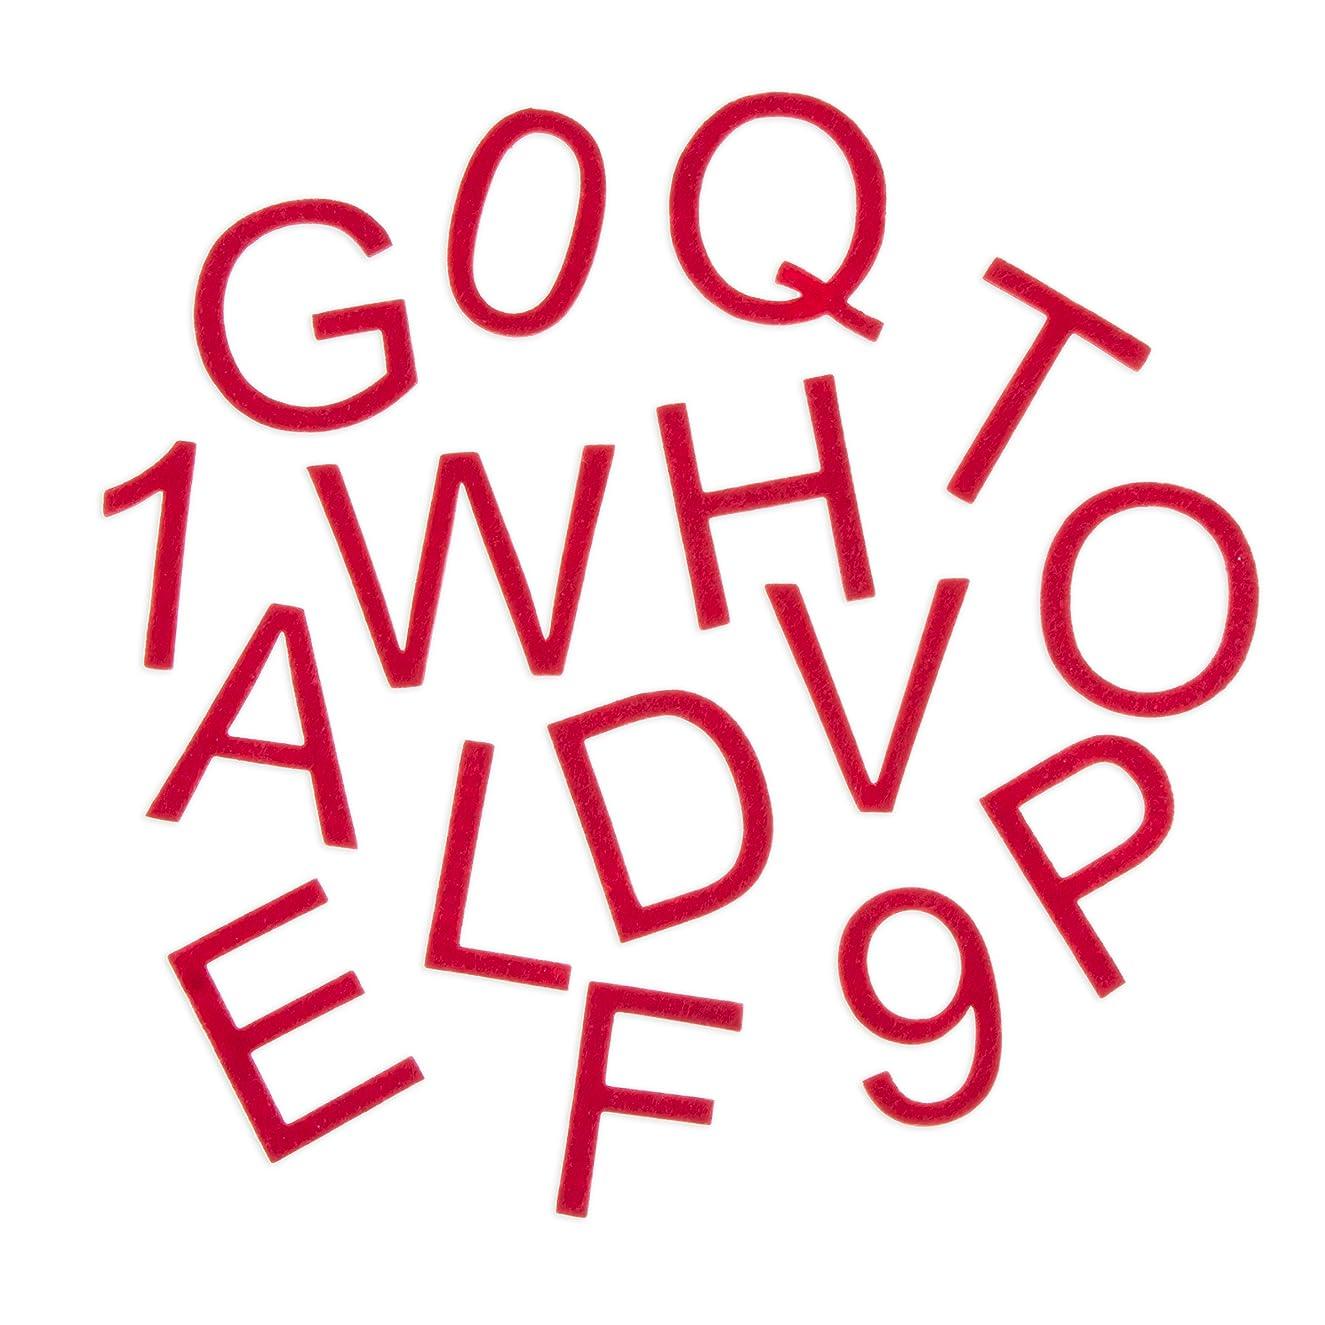 Darice Red Adhesive Felt Alphabet Letter Stickers